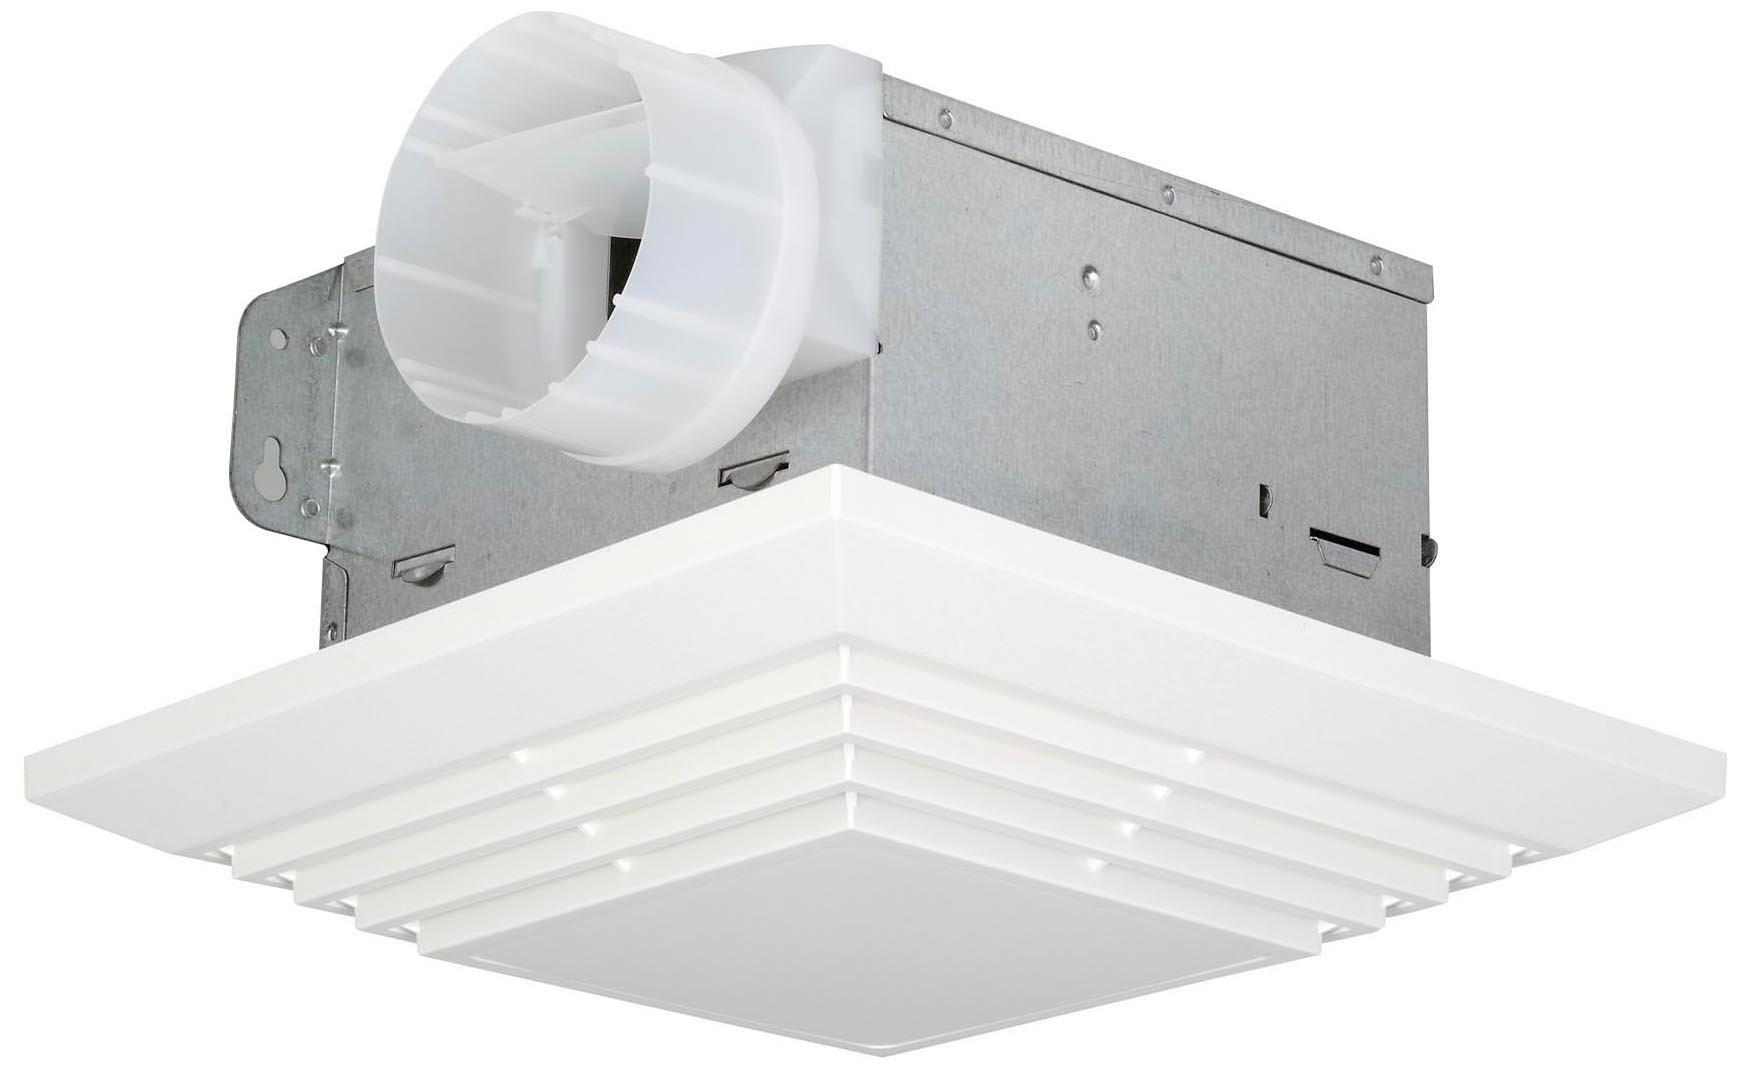 Craftmade TFV90 Bathroom Exhaust Fan